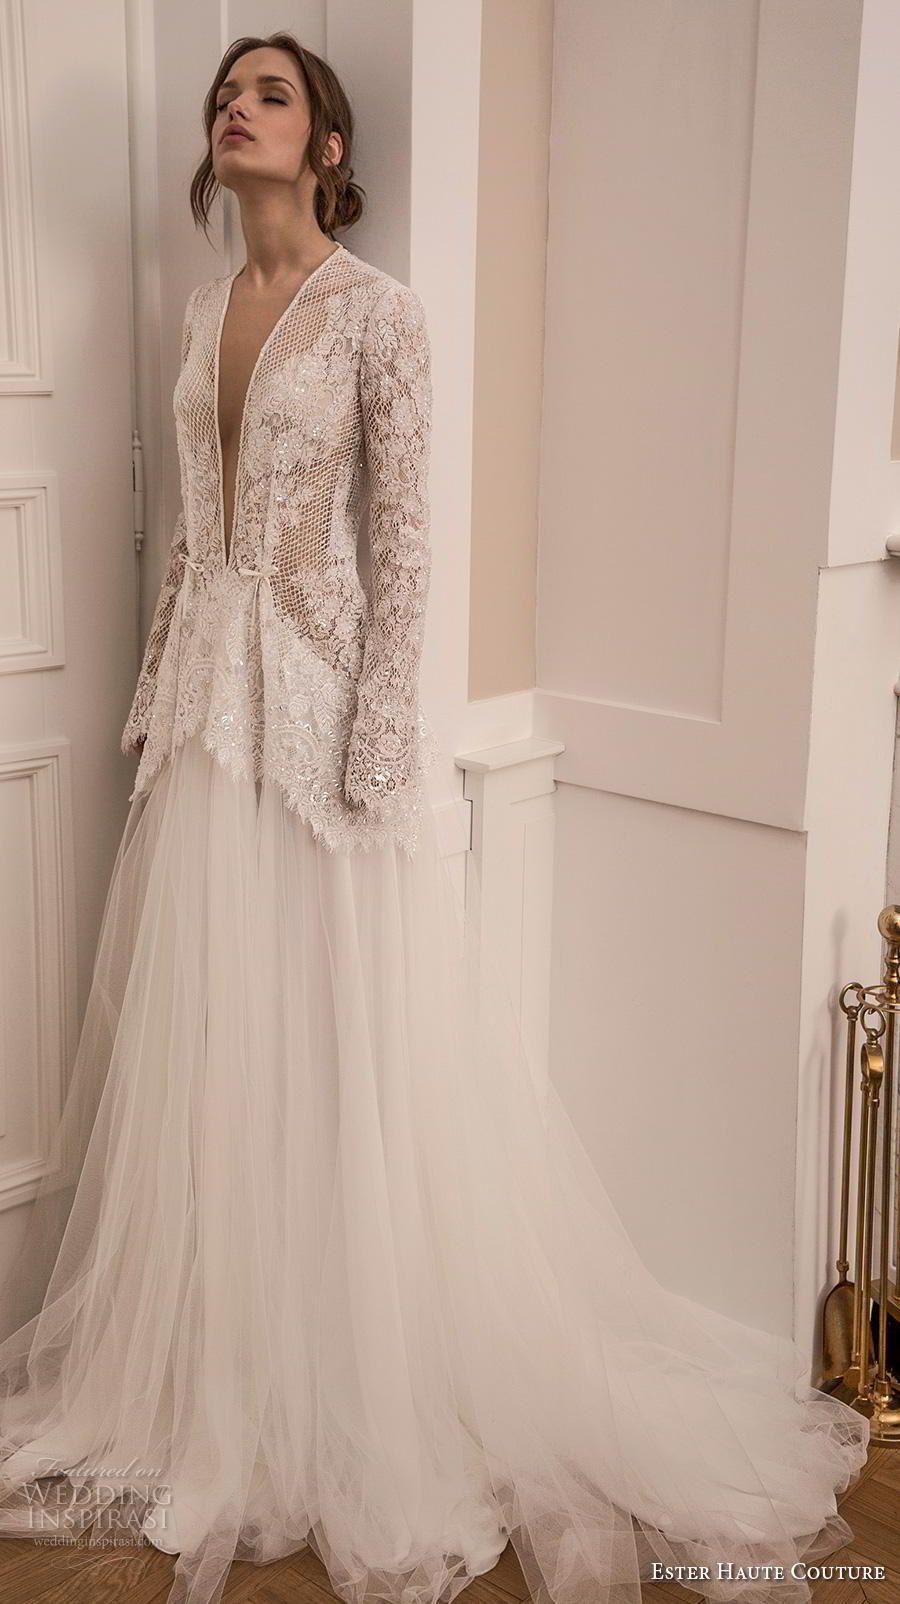 1f7f6011508 ester haute couture 2019 bridal long sleeves deep plunging v neck full  embellishment glitzy elegant sexy a line wedding dress keyhole back medium  train (9) ...